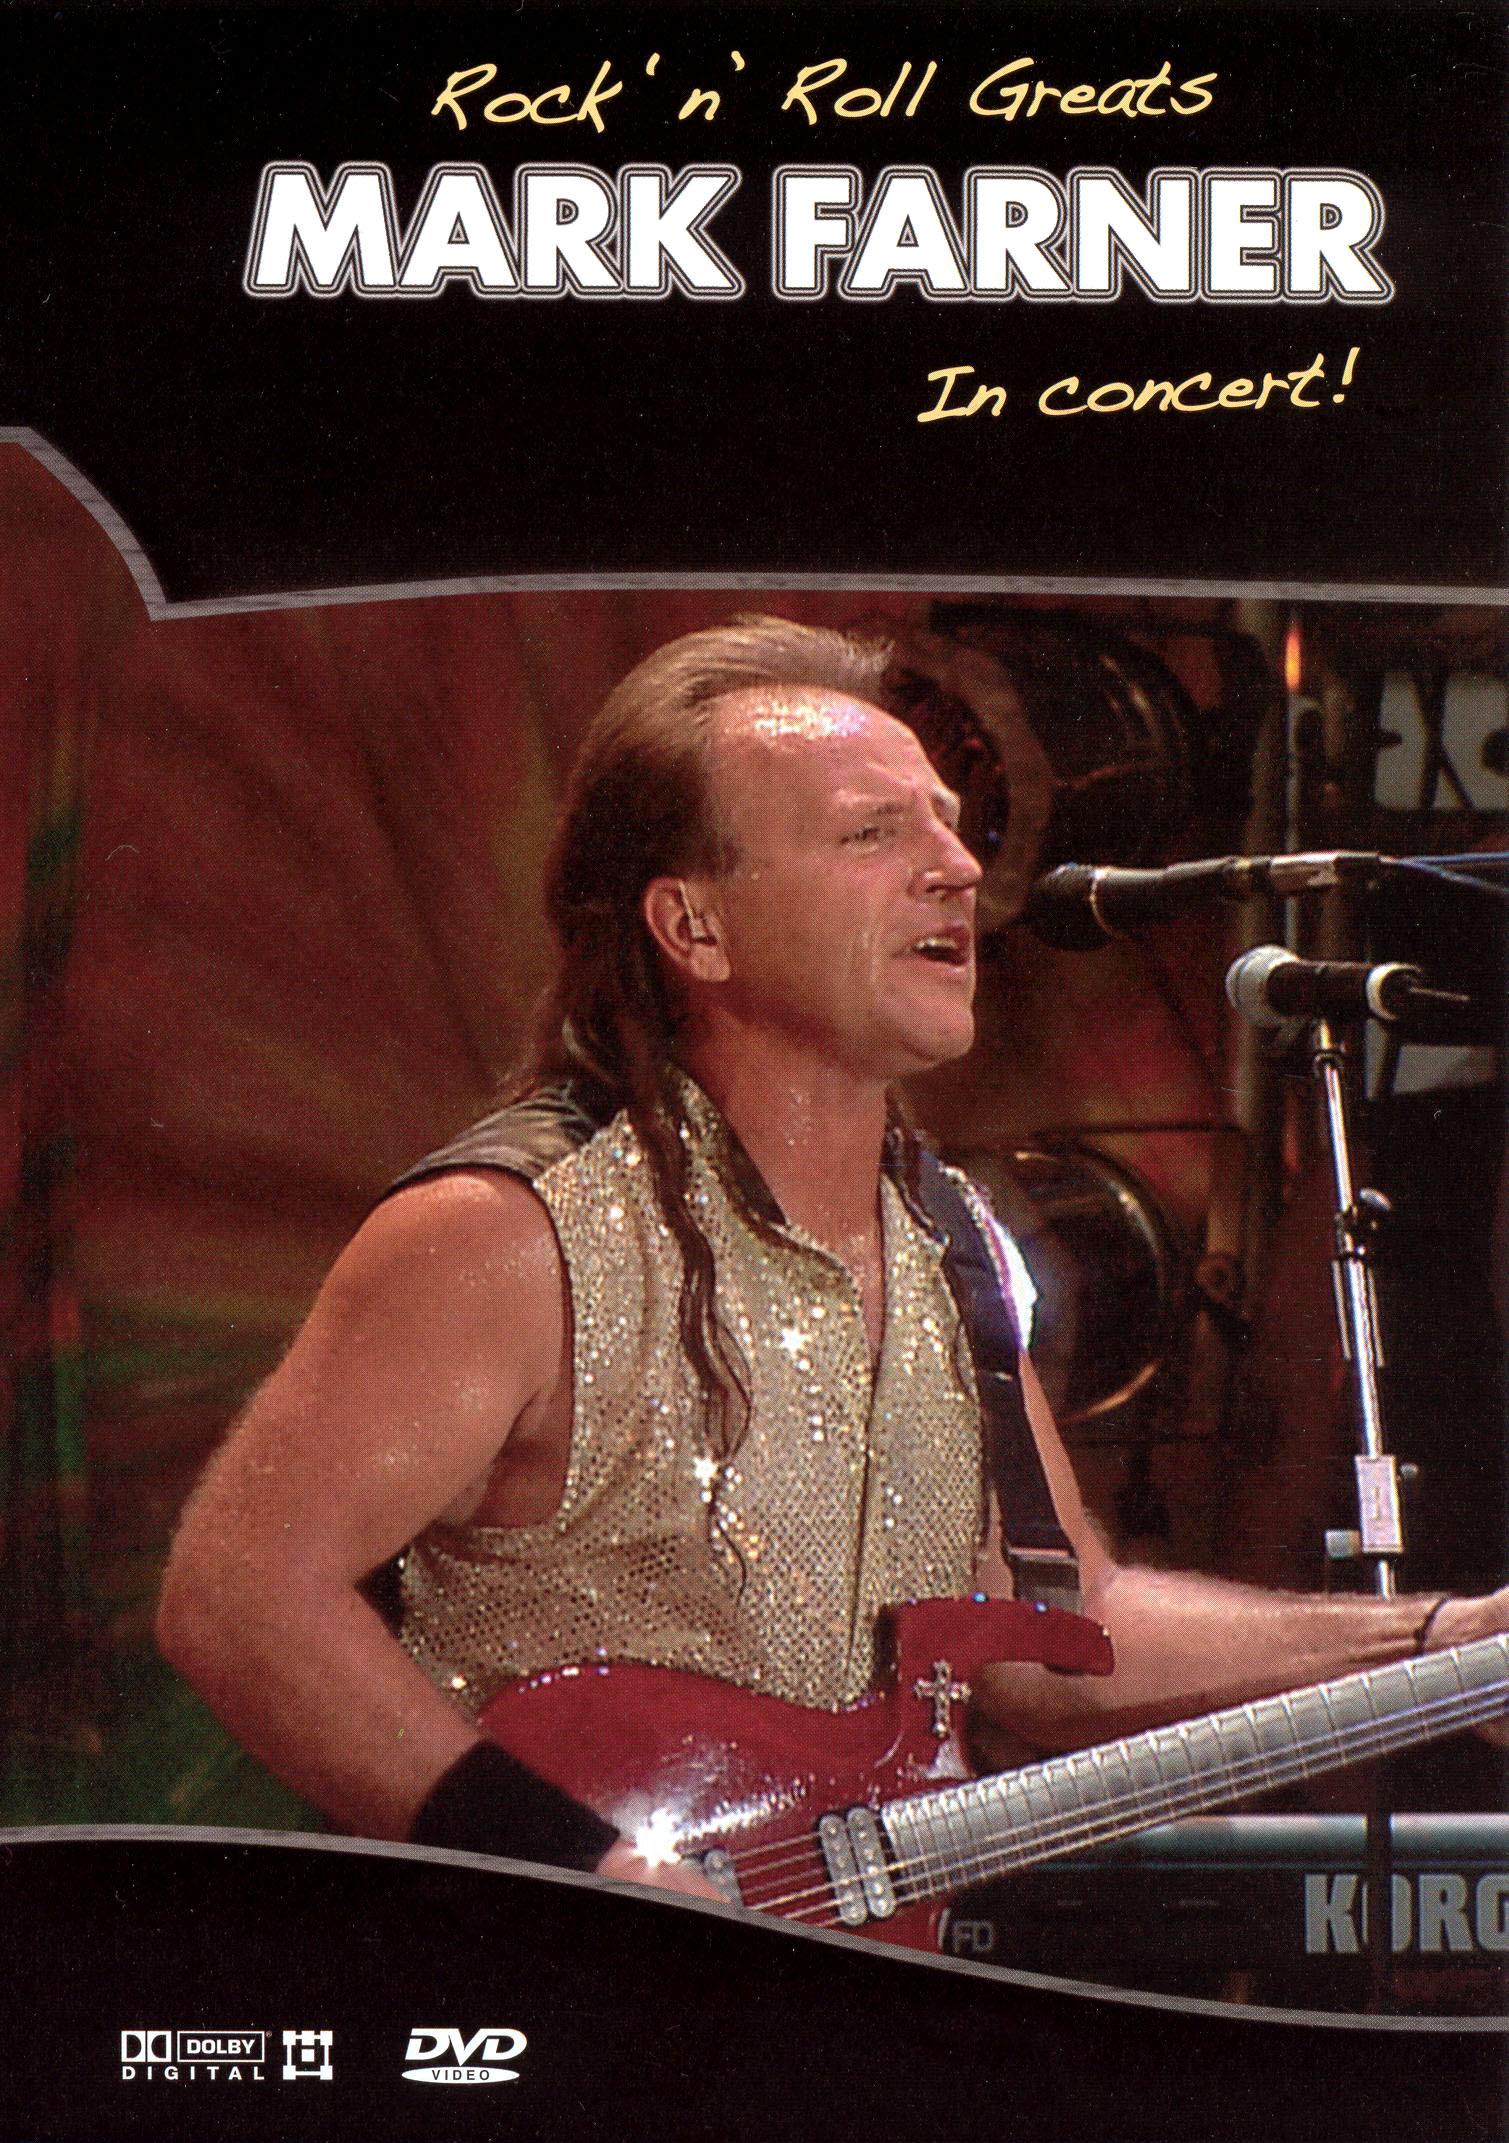 Mark Farner: In Concert!